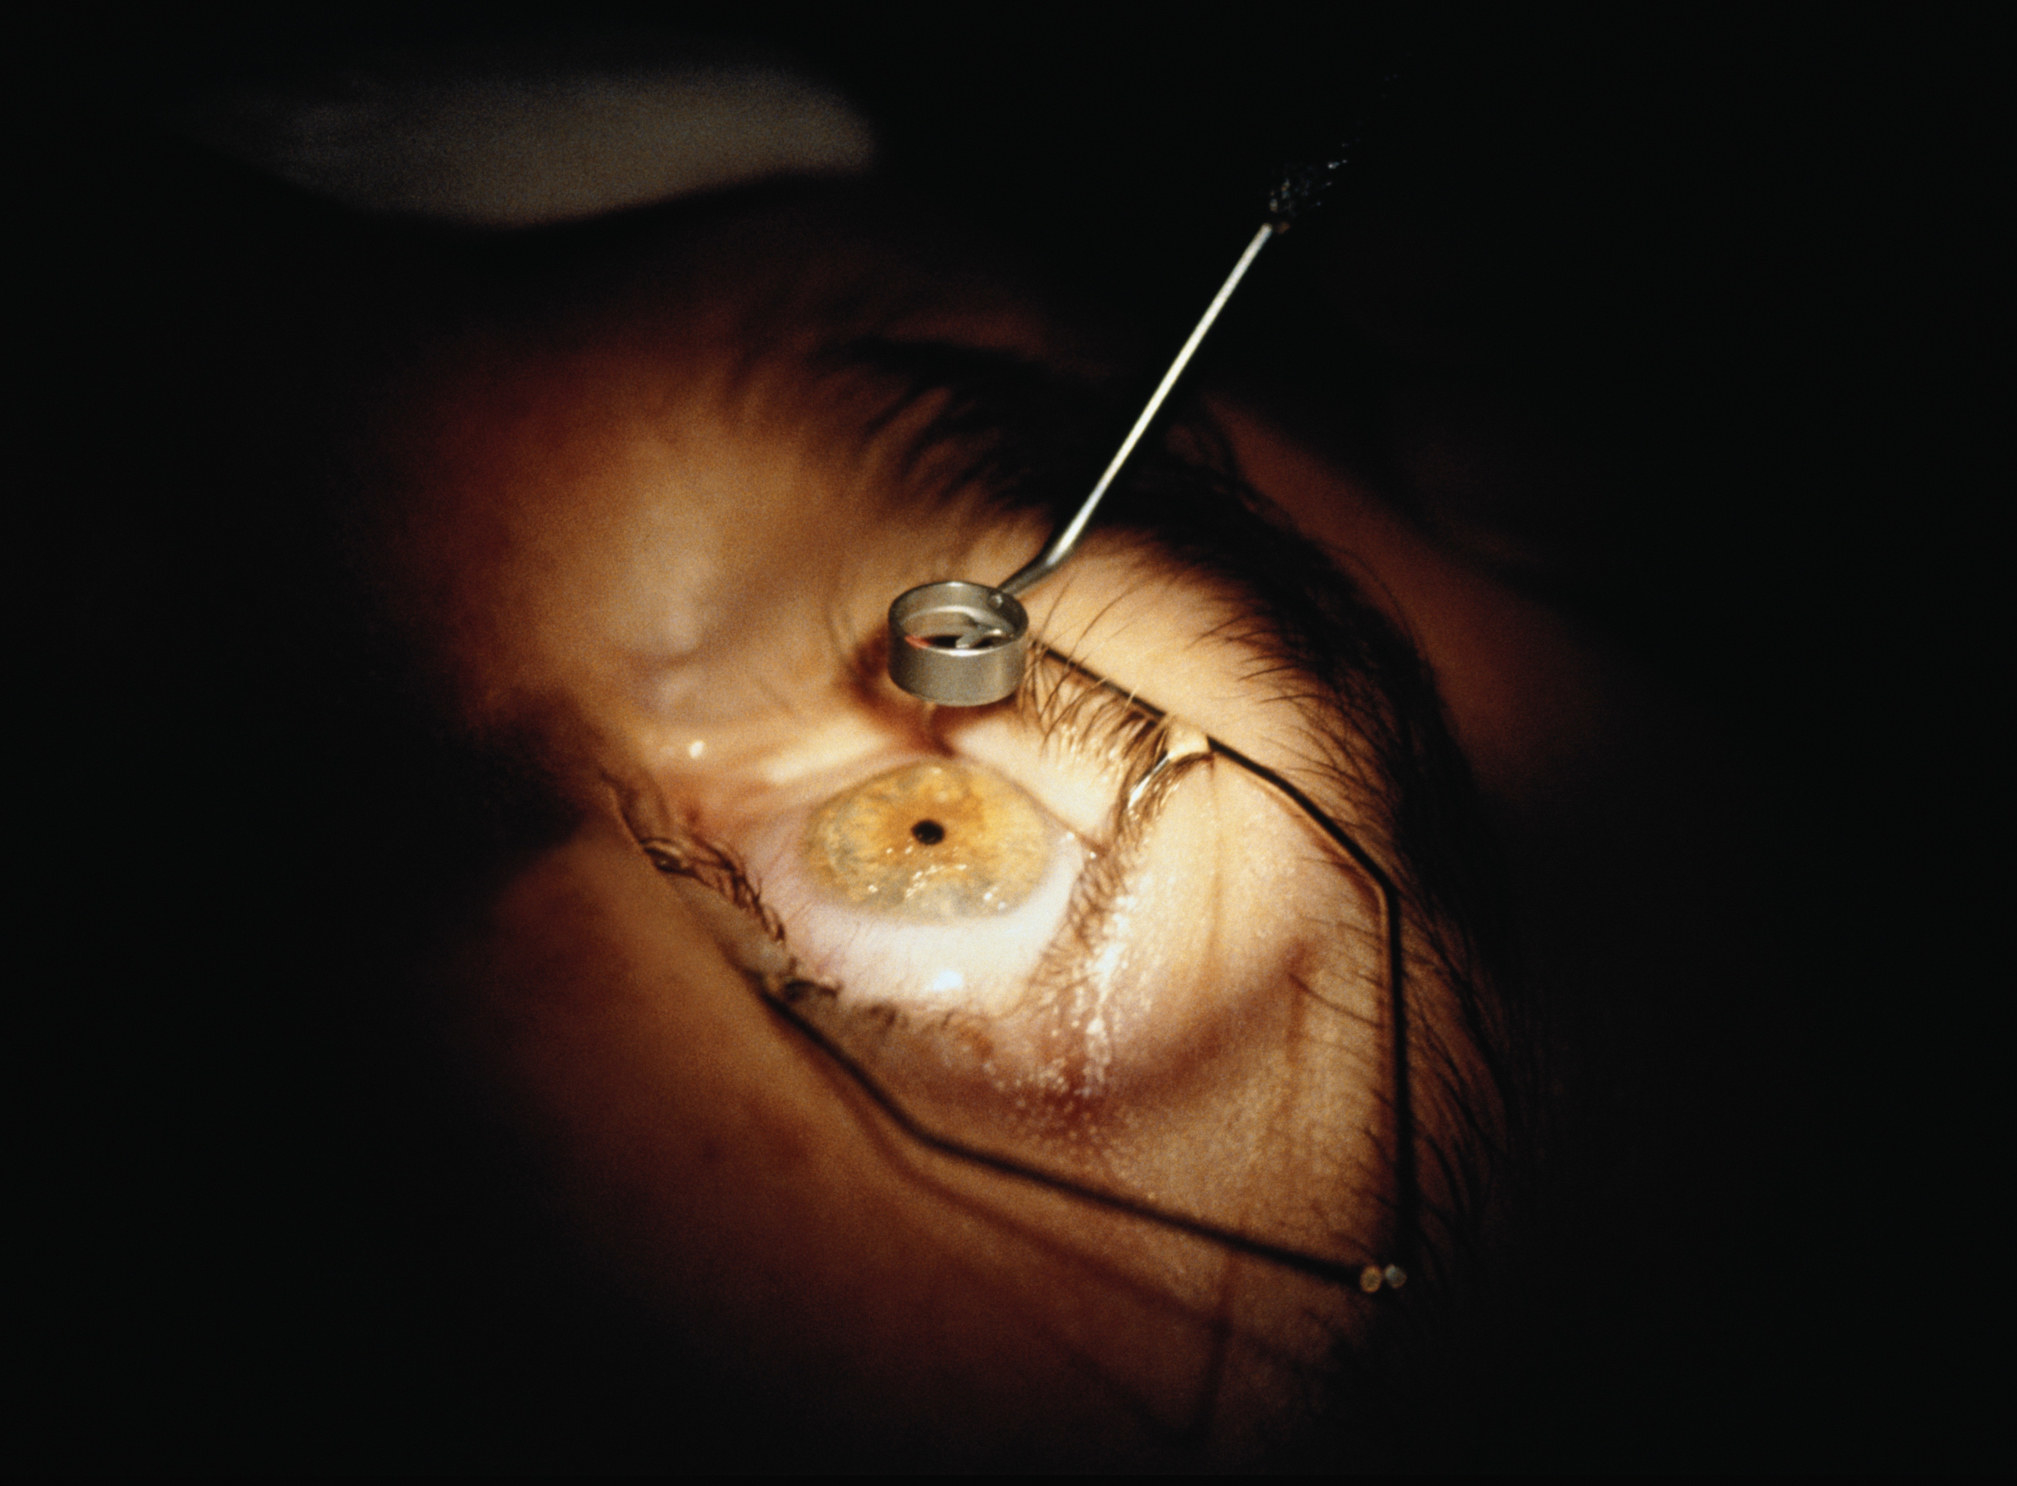 A close-up of an eye during surgery